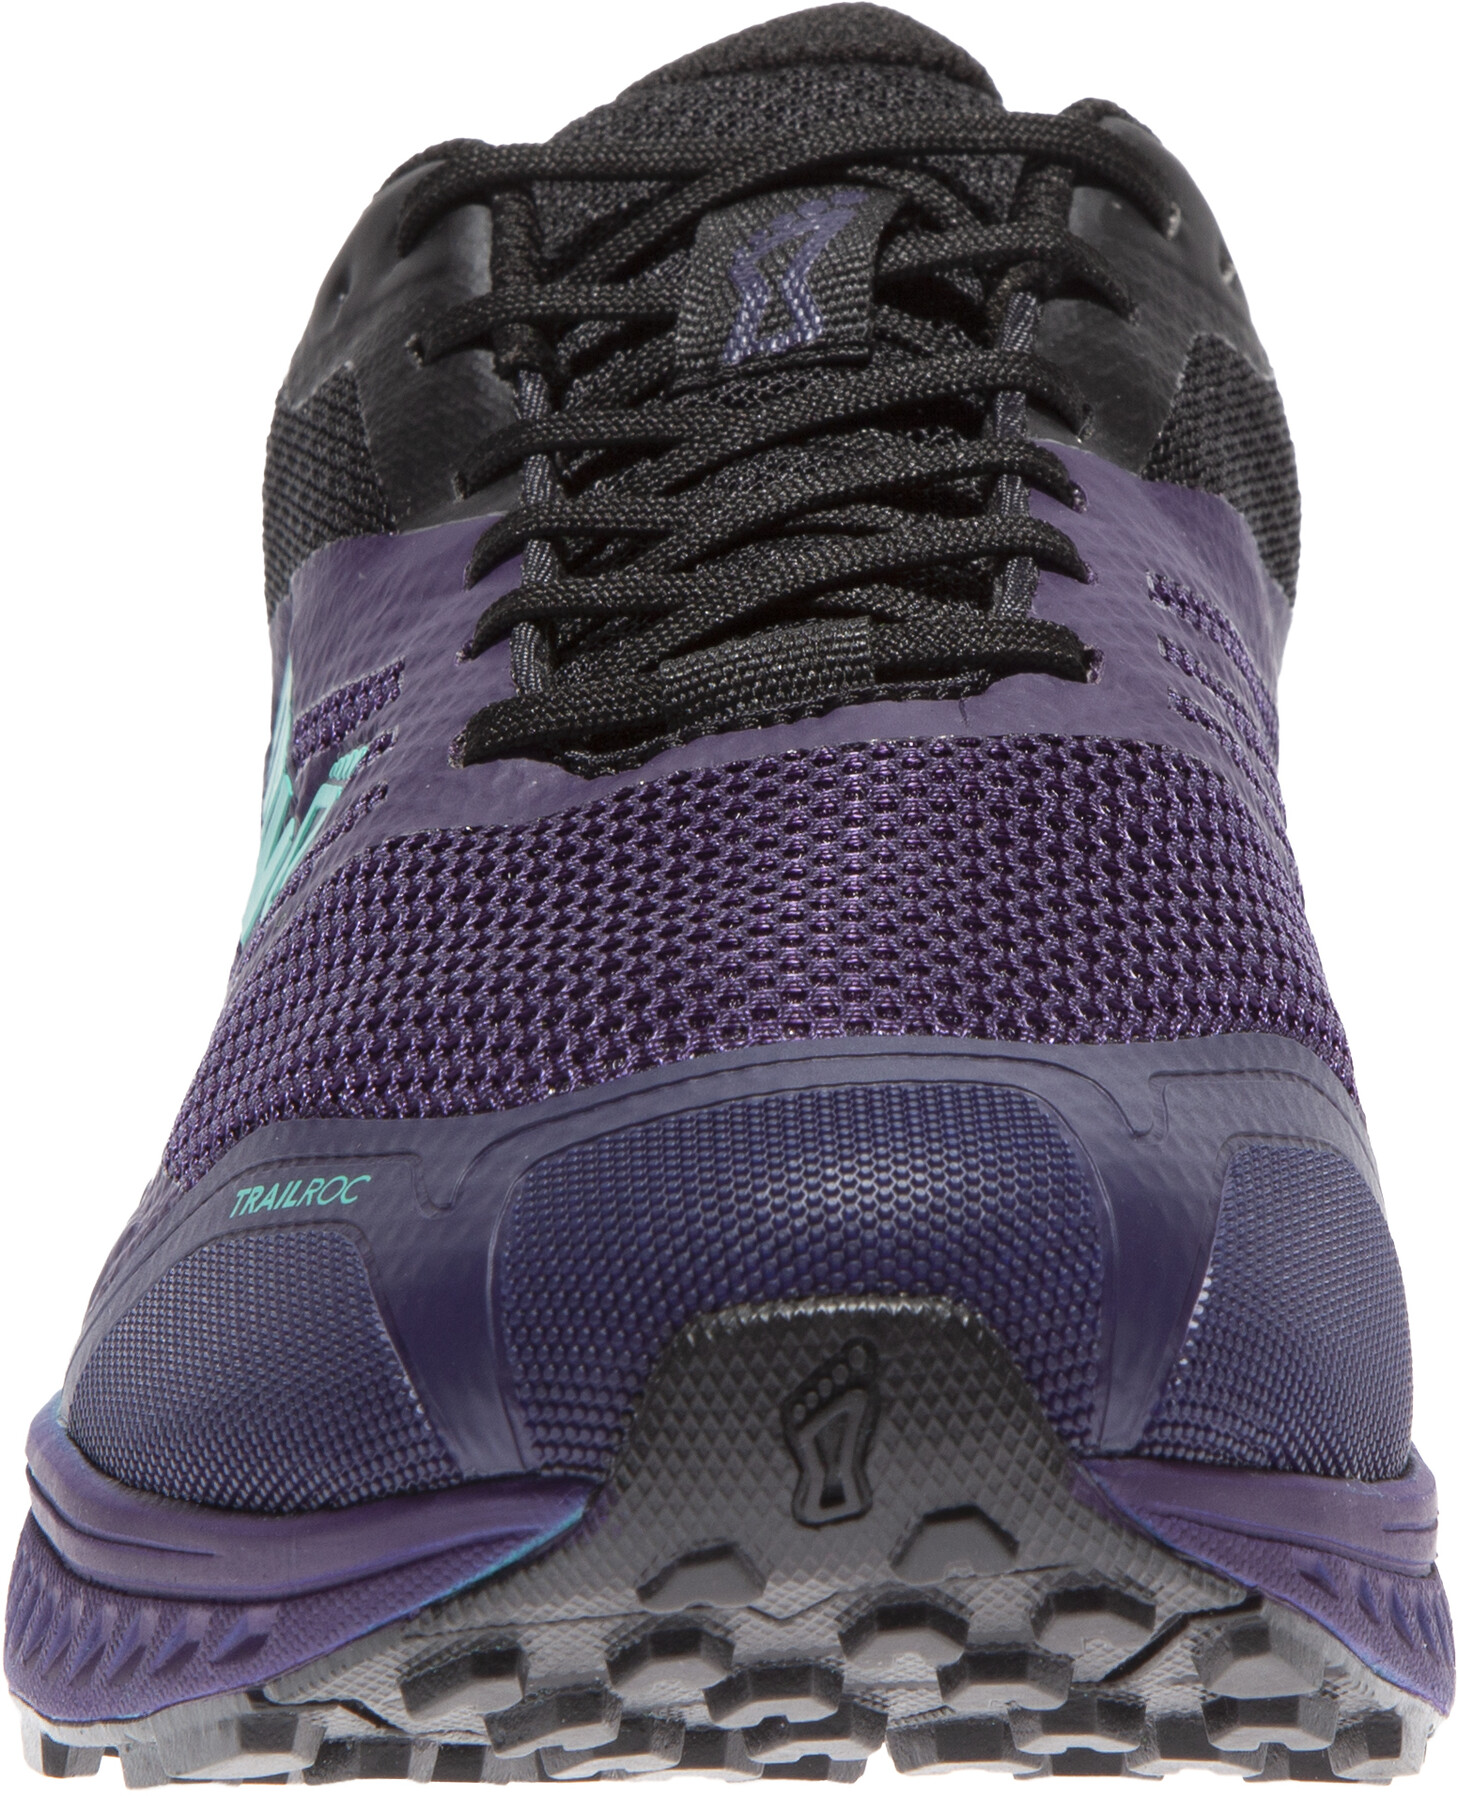 inov 8 Trailroc G 280 Shoes Women purpleblack